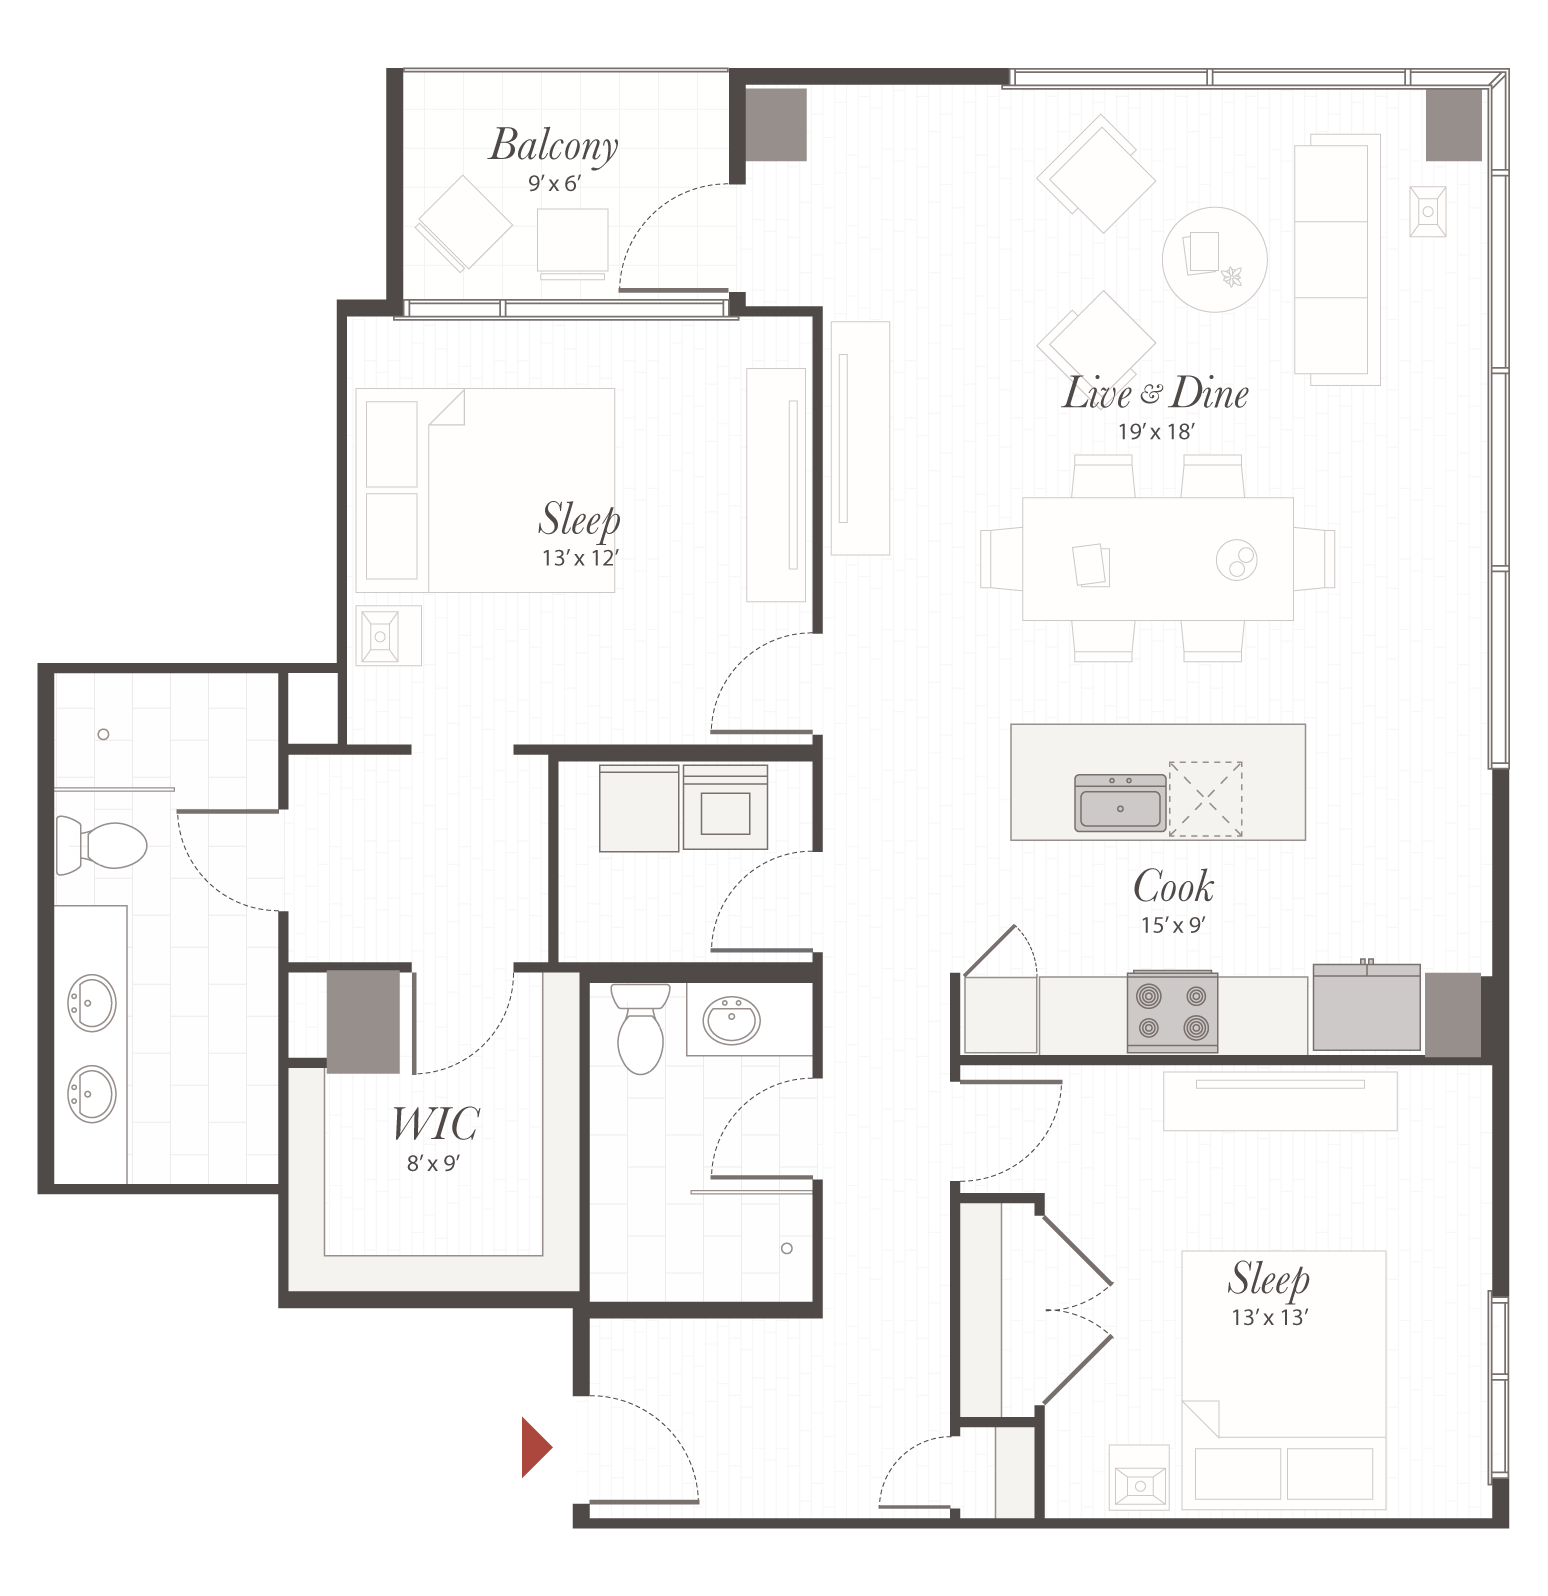 B6 - 1 Bedroom Apartment Cincinnati   Encore Apartments